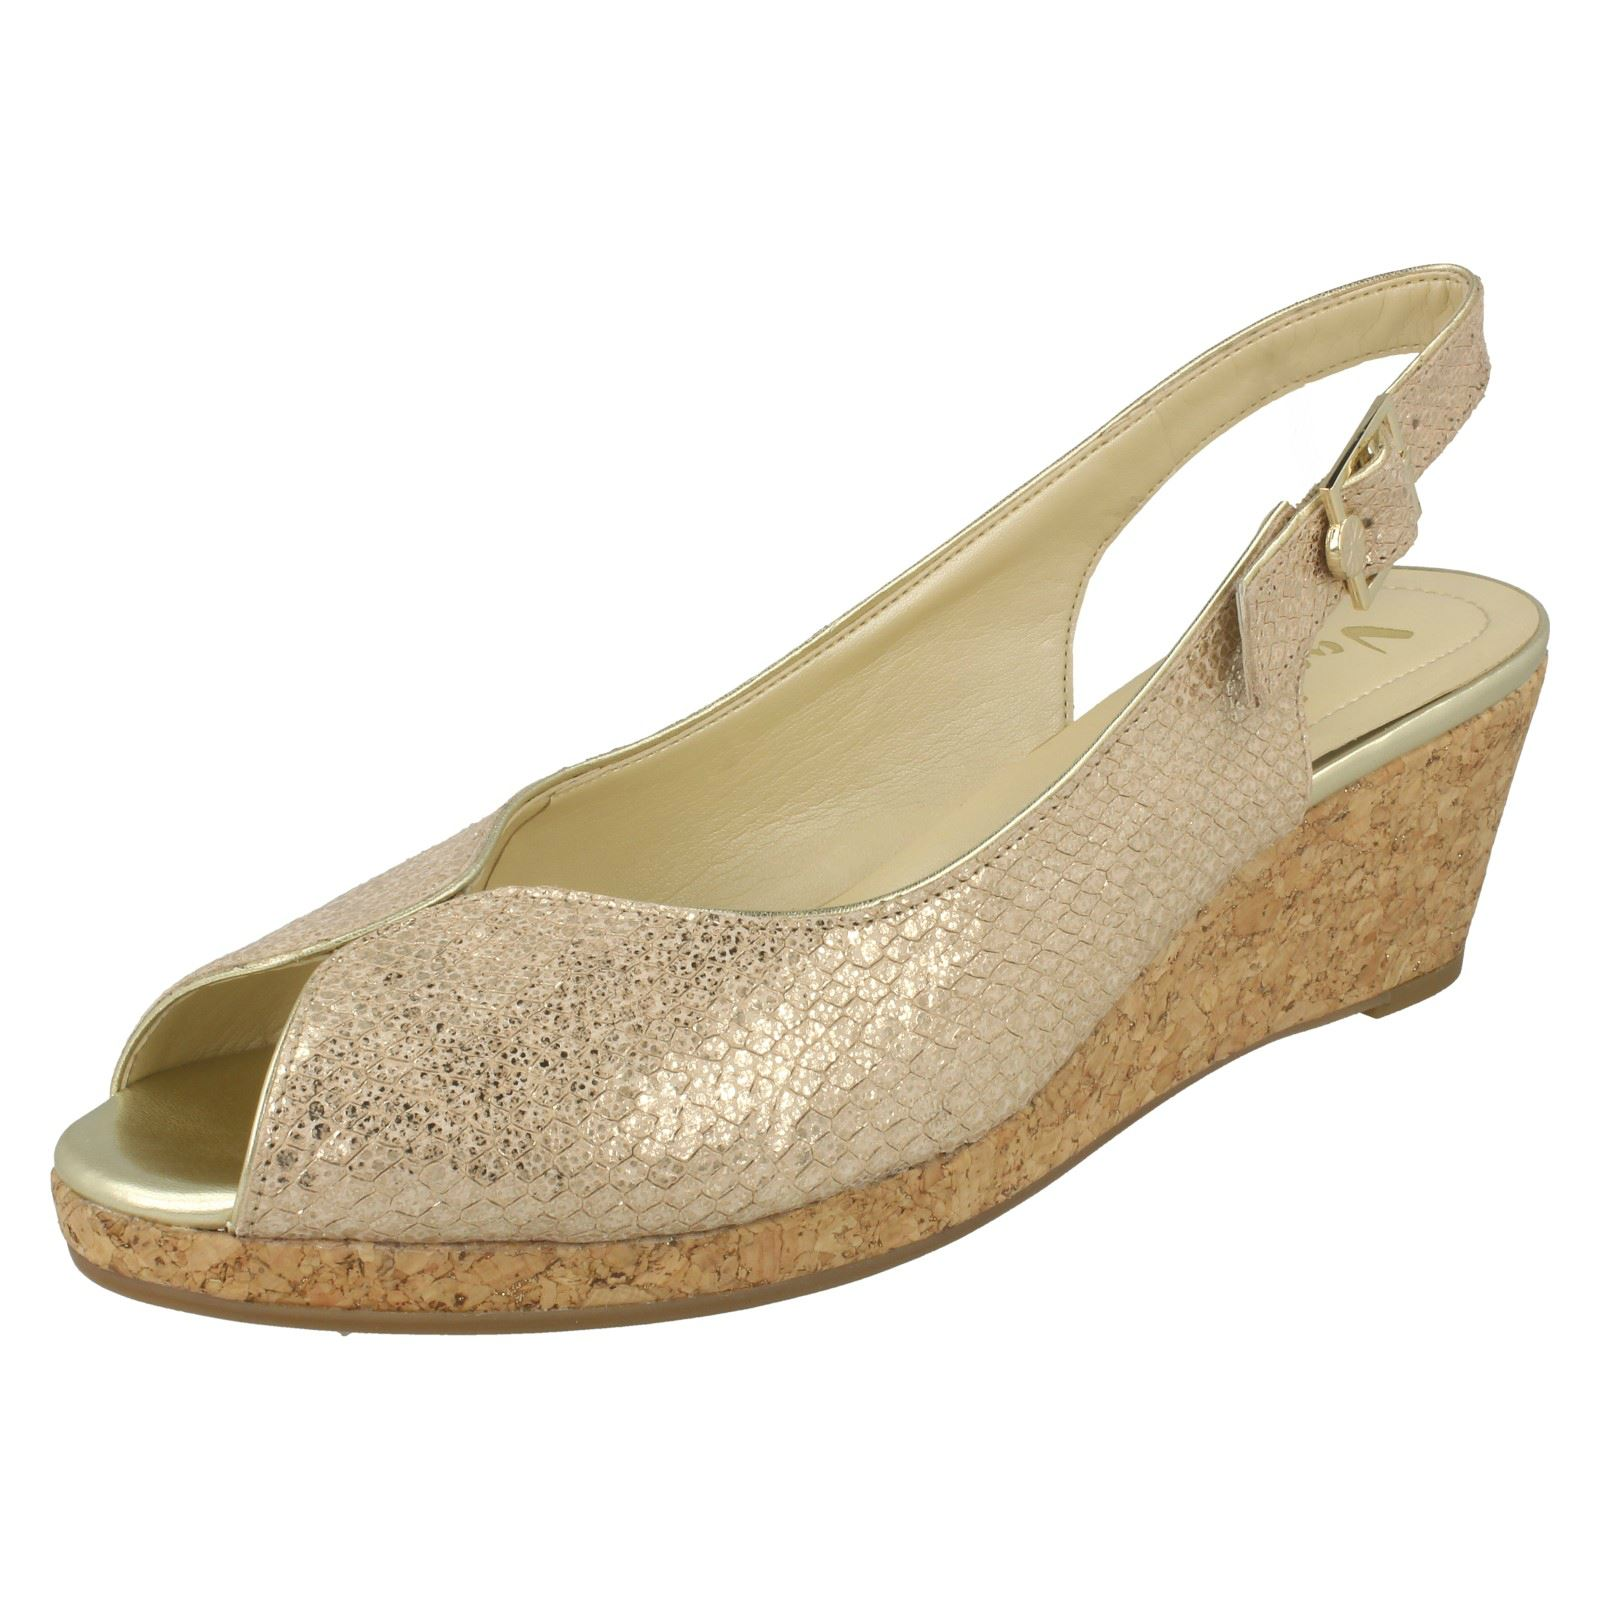 Ladies-Van-Dal-Cork-Wedge-Sandals-039-Gable-039 thumbnail 9